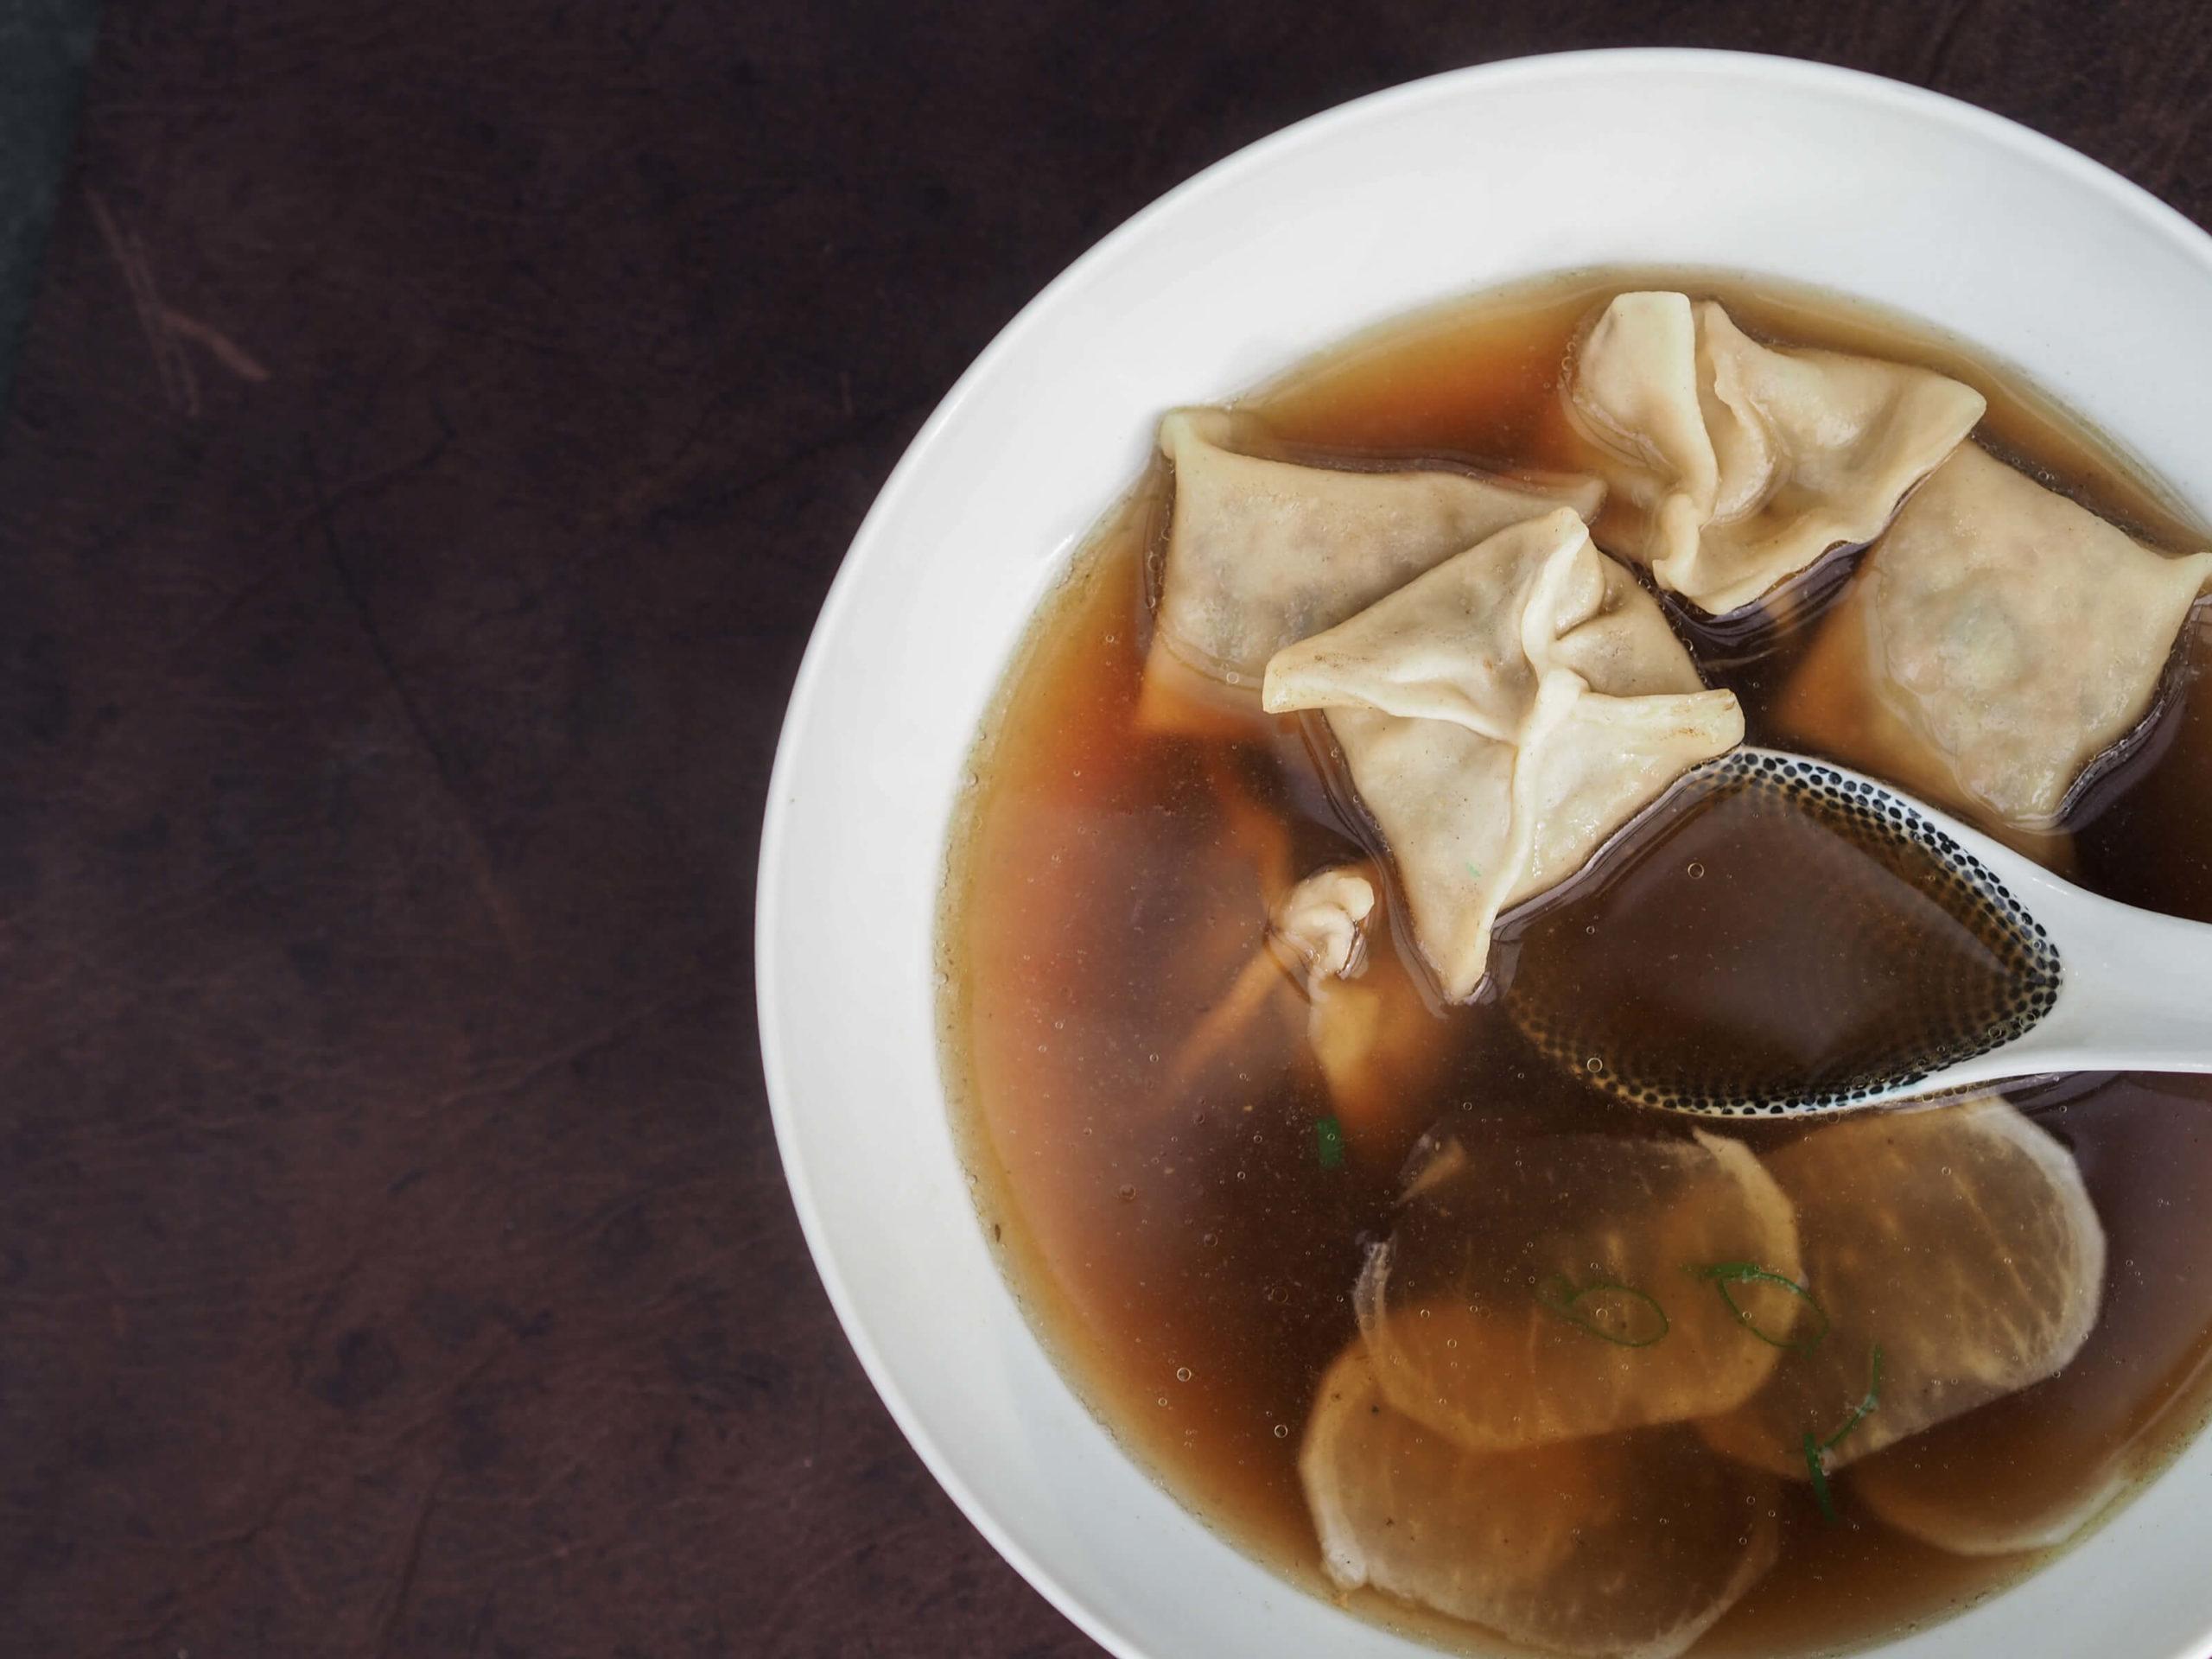 Wan Tan Suppe |Brühe | selbstgemacht, Wunschleder HOME